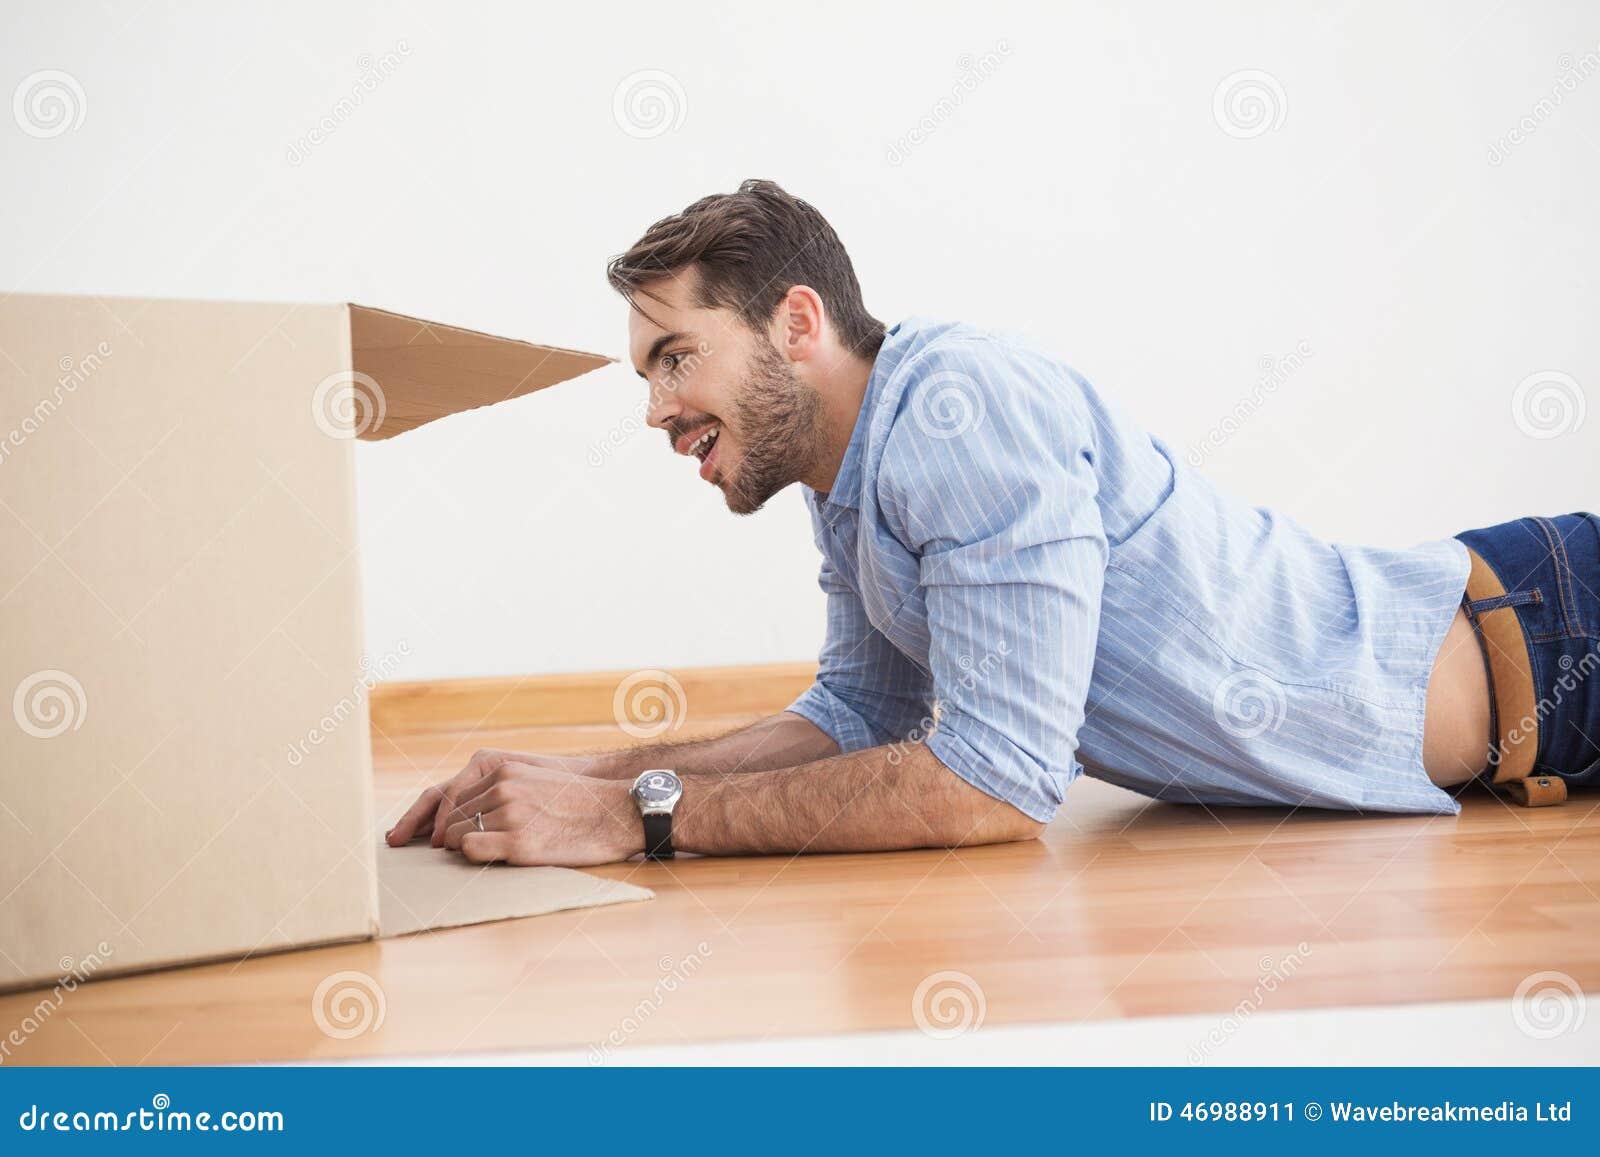 smiling man looking inside cardboard box stock photo image 46988911. Black Bedroom Furniture Sets. Home Design Ideas